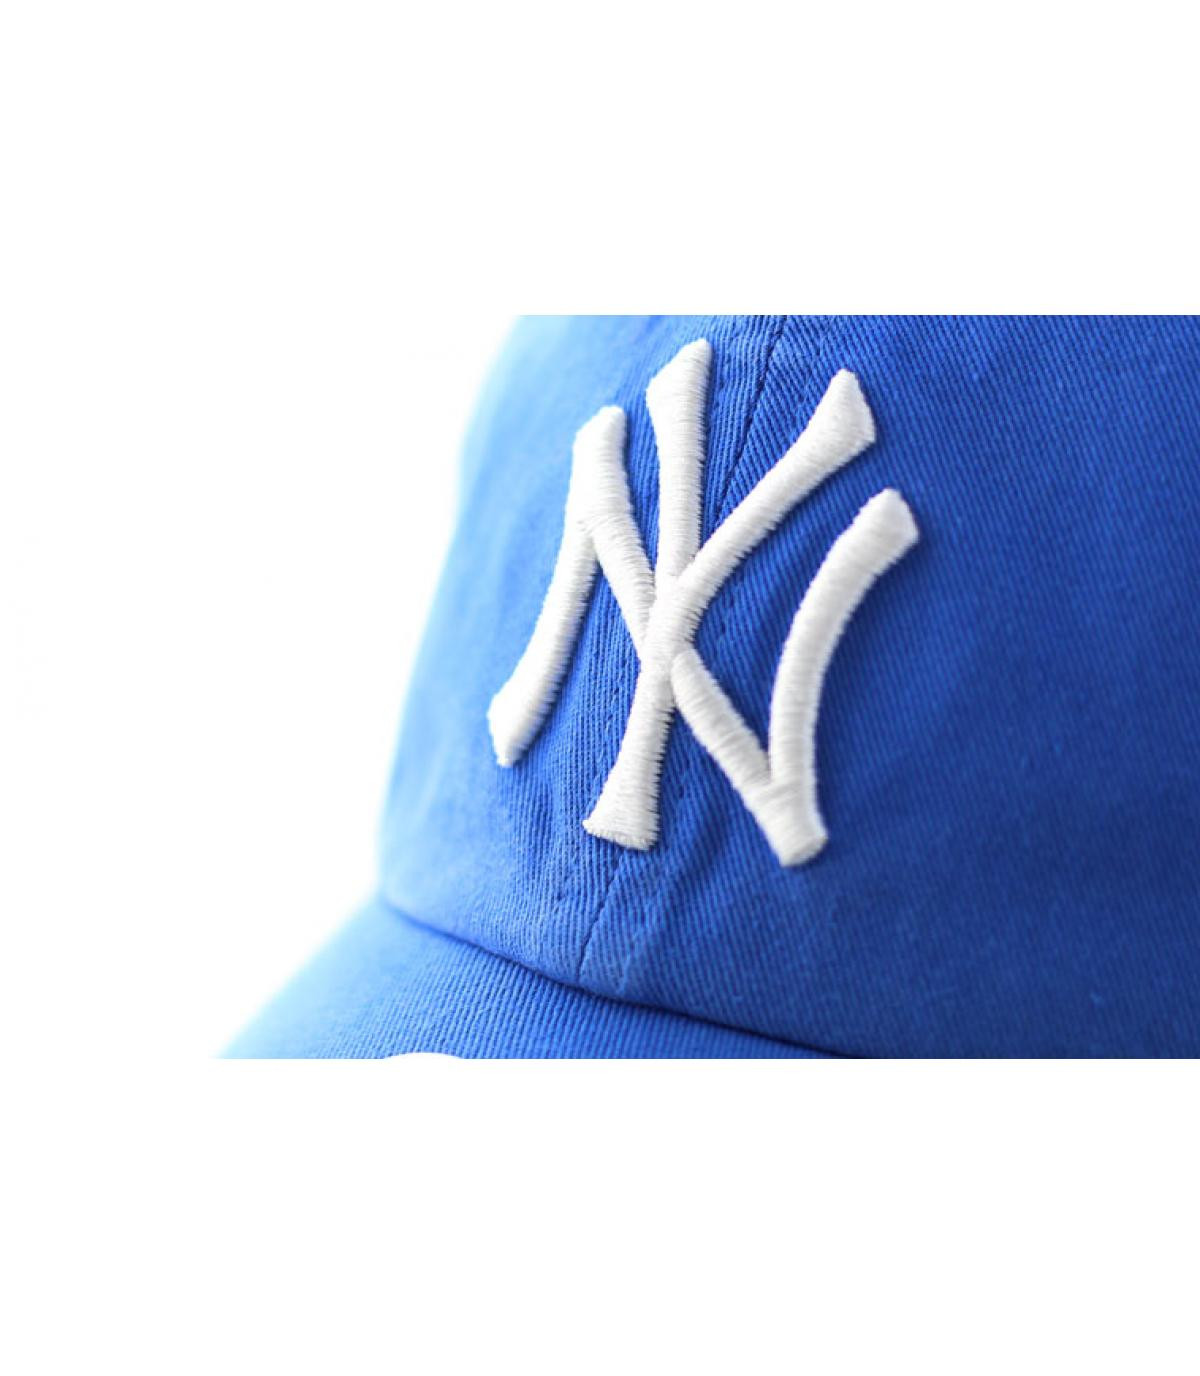 Details Clean Up NY blue raz - Abbildung 3